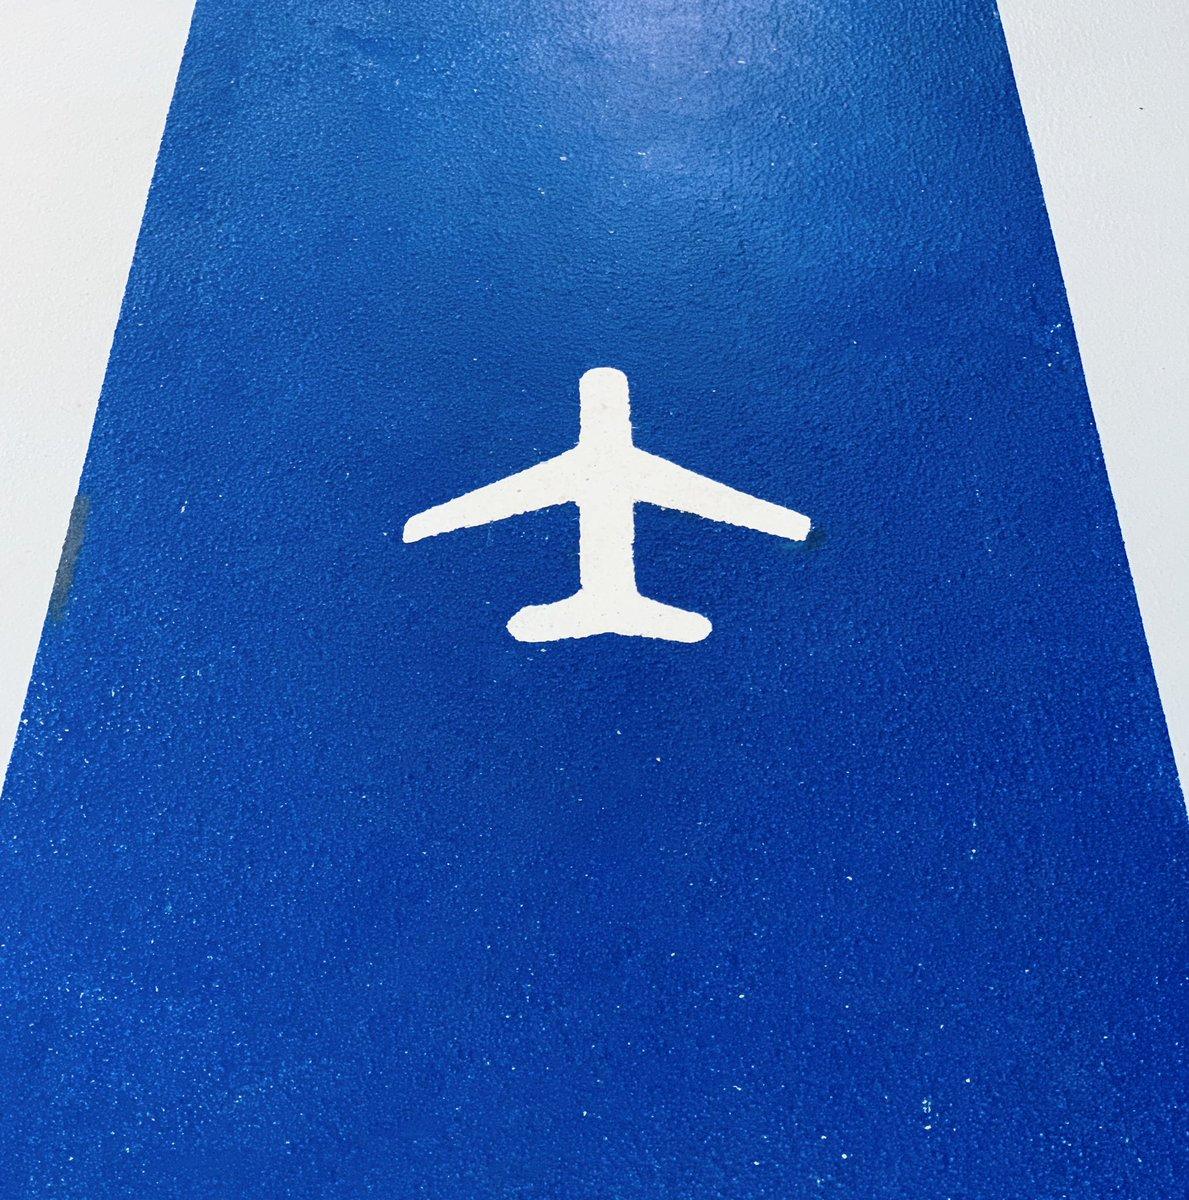 Vamos! 🇪🇸✈️  #A320 #WeMakeitFly #Airbus #Lufthansa #HalaMadrid @MUC_Airport